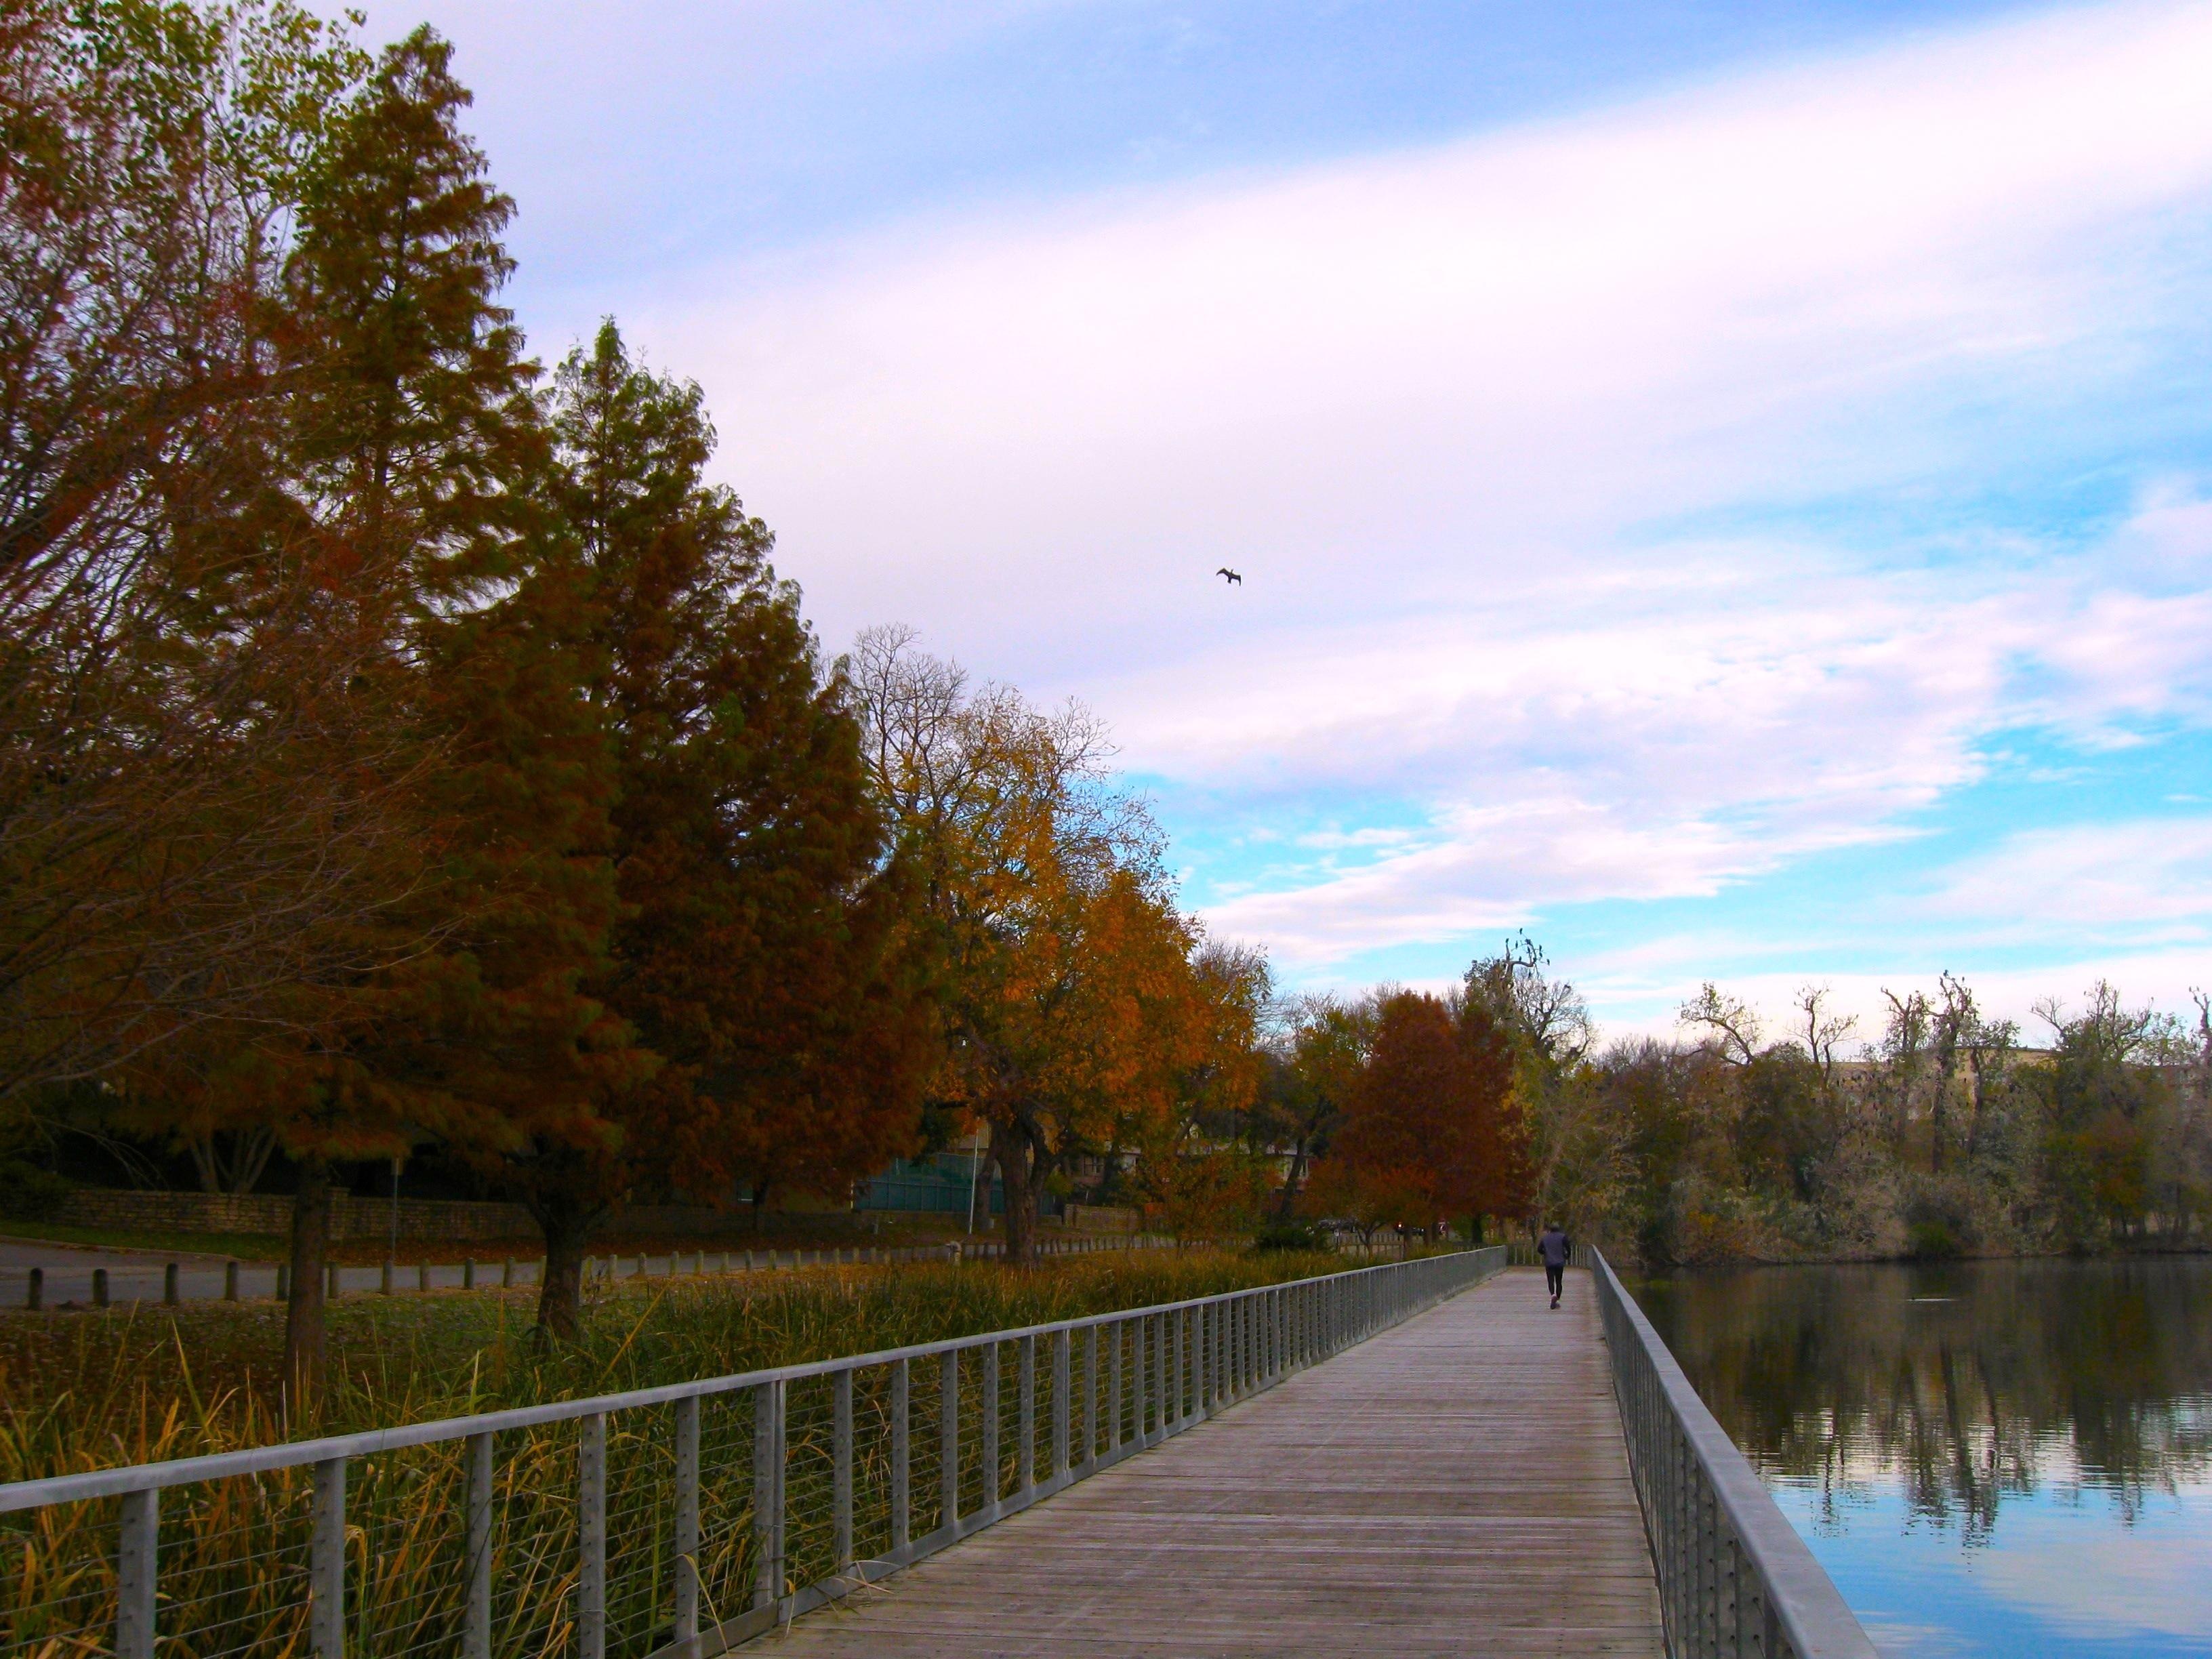 Board Walk, White Rock Lake Park - panoramio.jpg